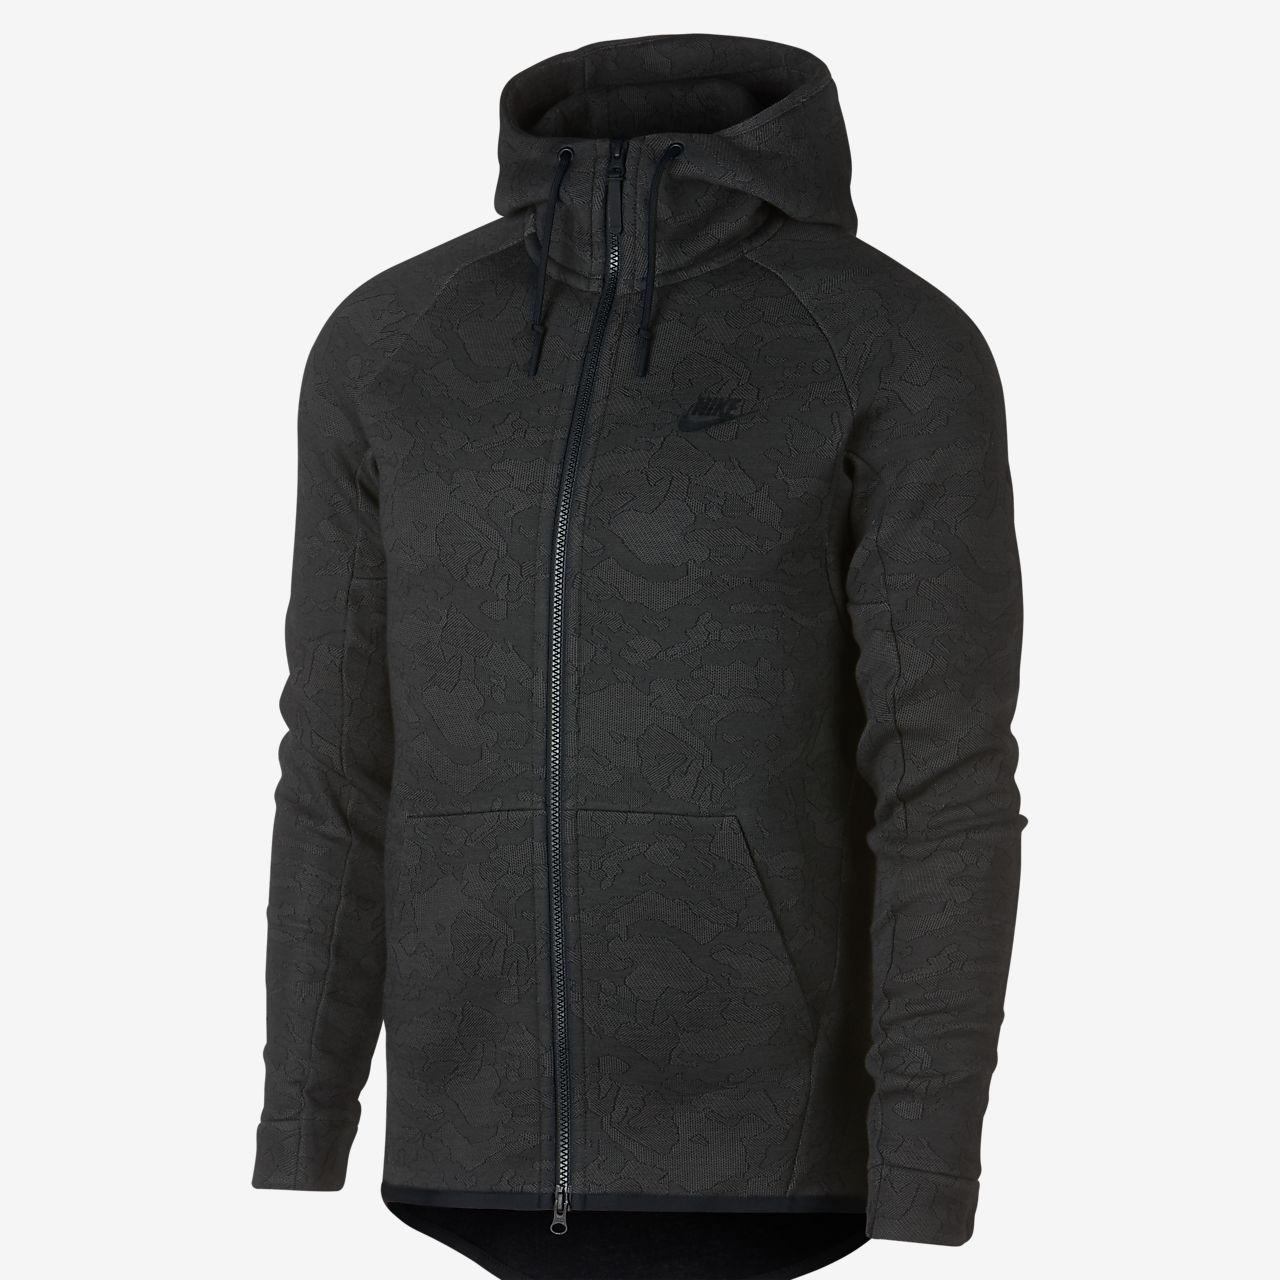 sweat capuche enti rement zipp nike sportswear tech fleece pour homme be. Black Bedroom Furniture Sets. Home Design Ideas